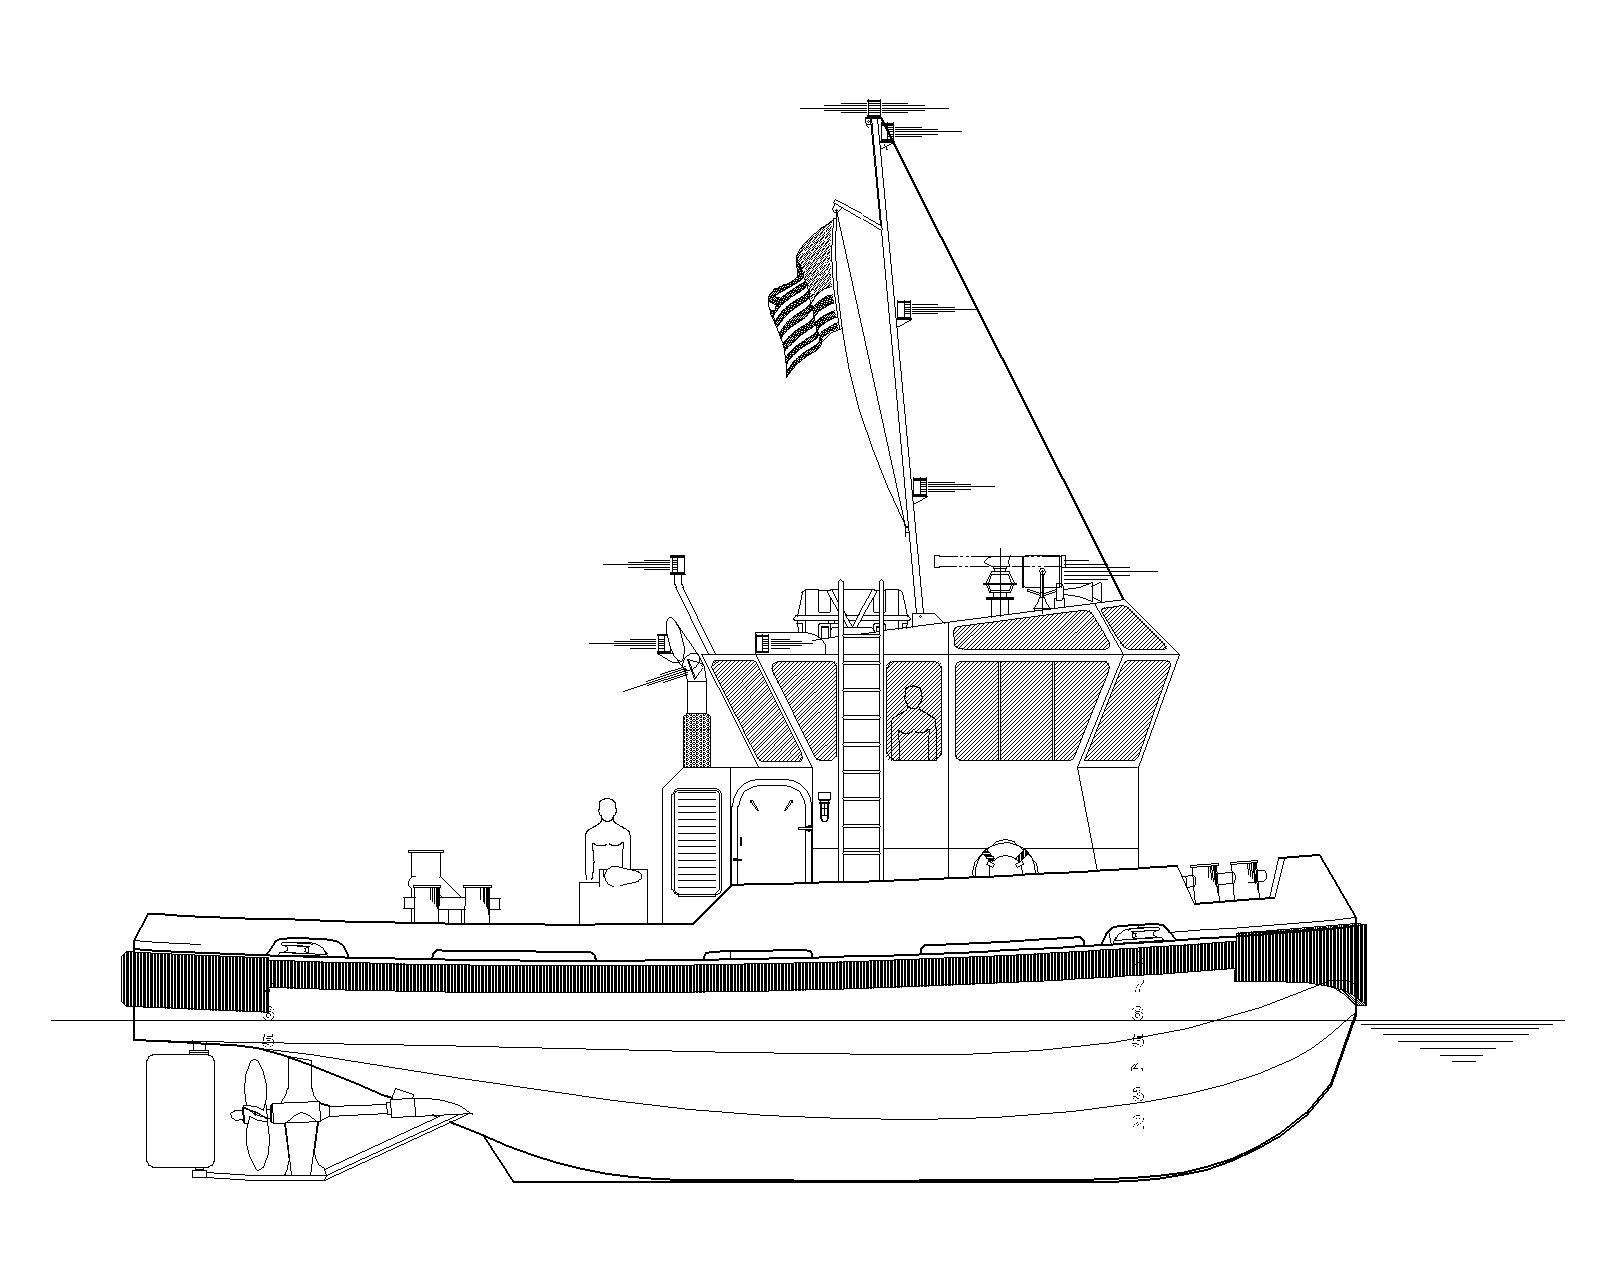 13425-100 outboard profile